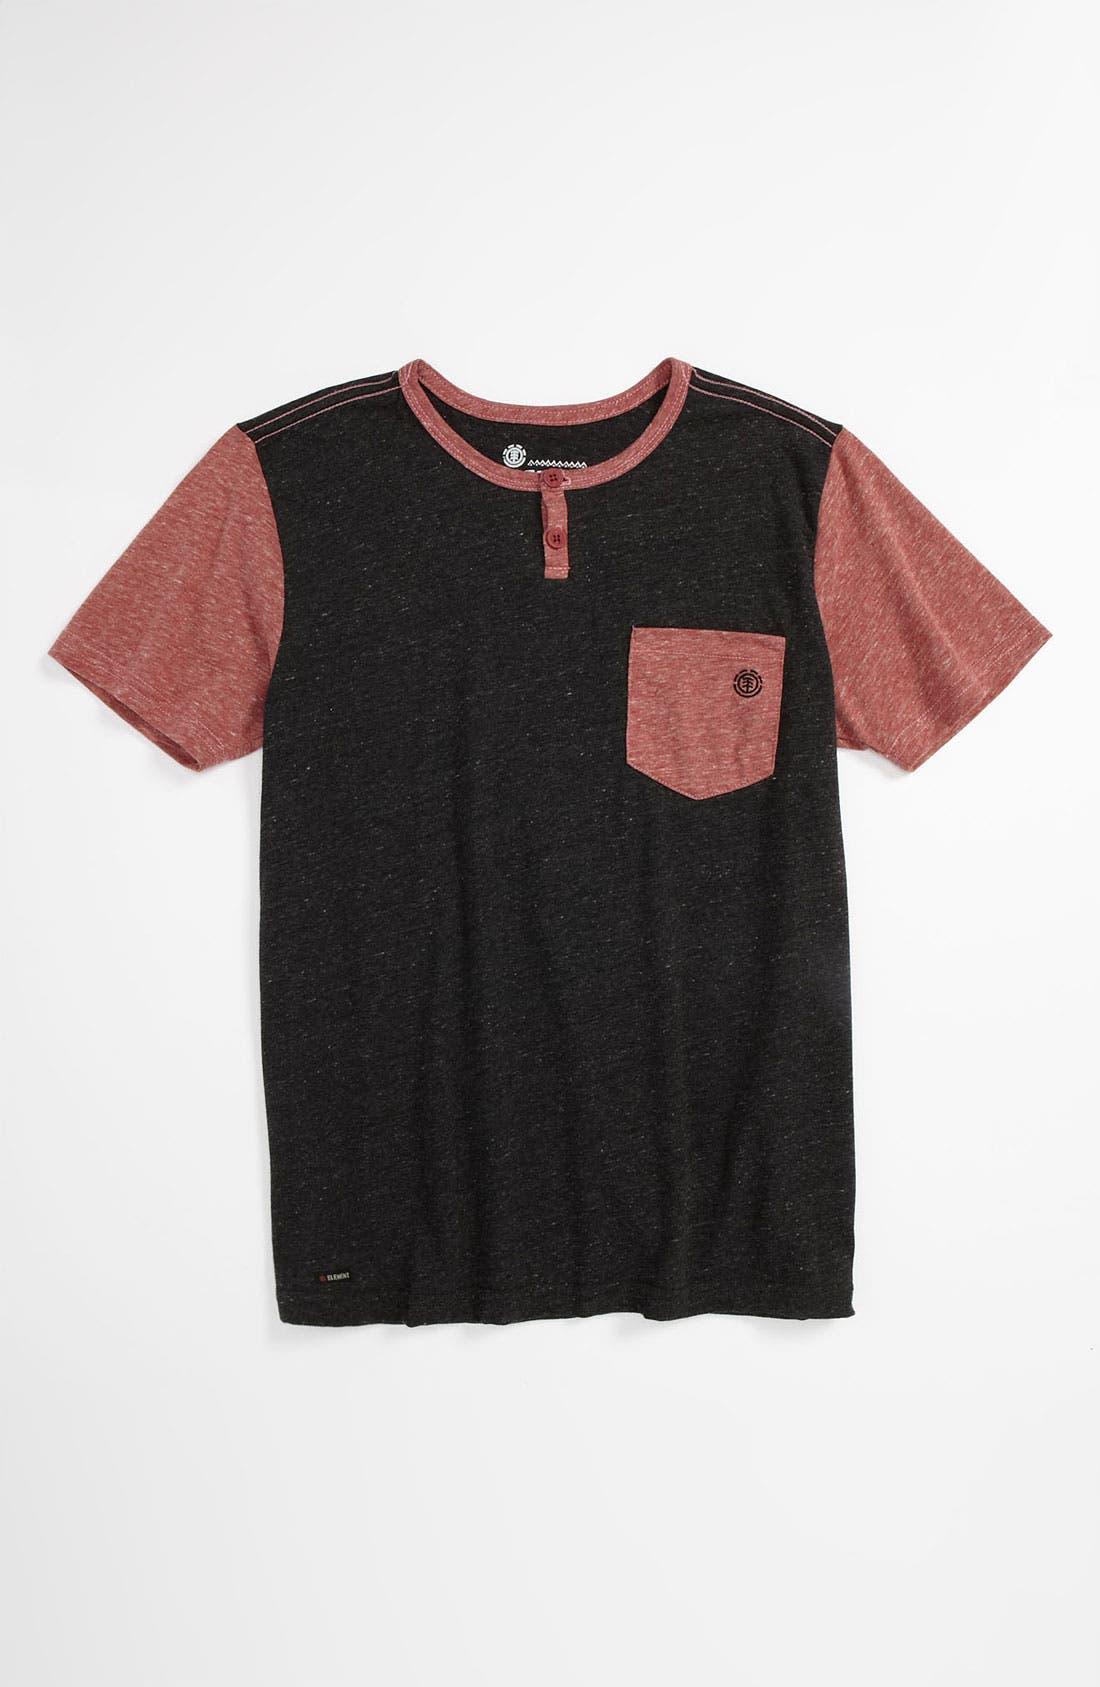 Alternate Image 1 Selected - Element 'Mason' Short Sleeve Henley T-Shirt (Big Boys)